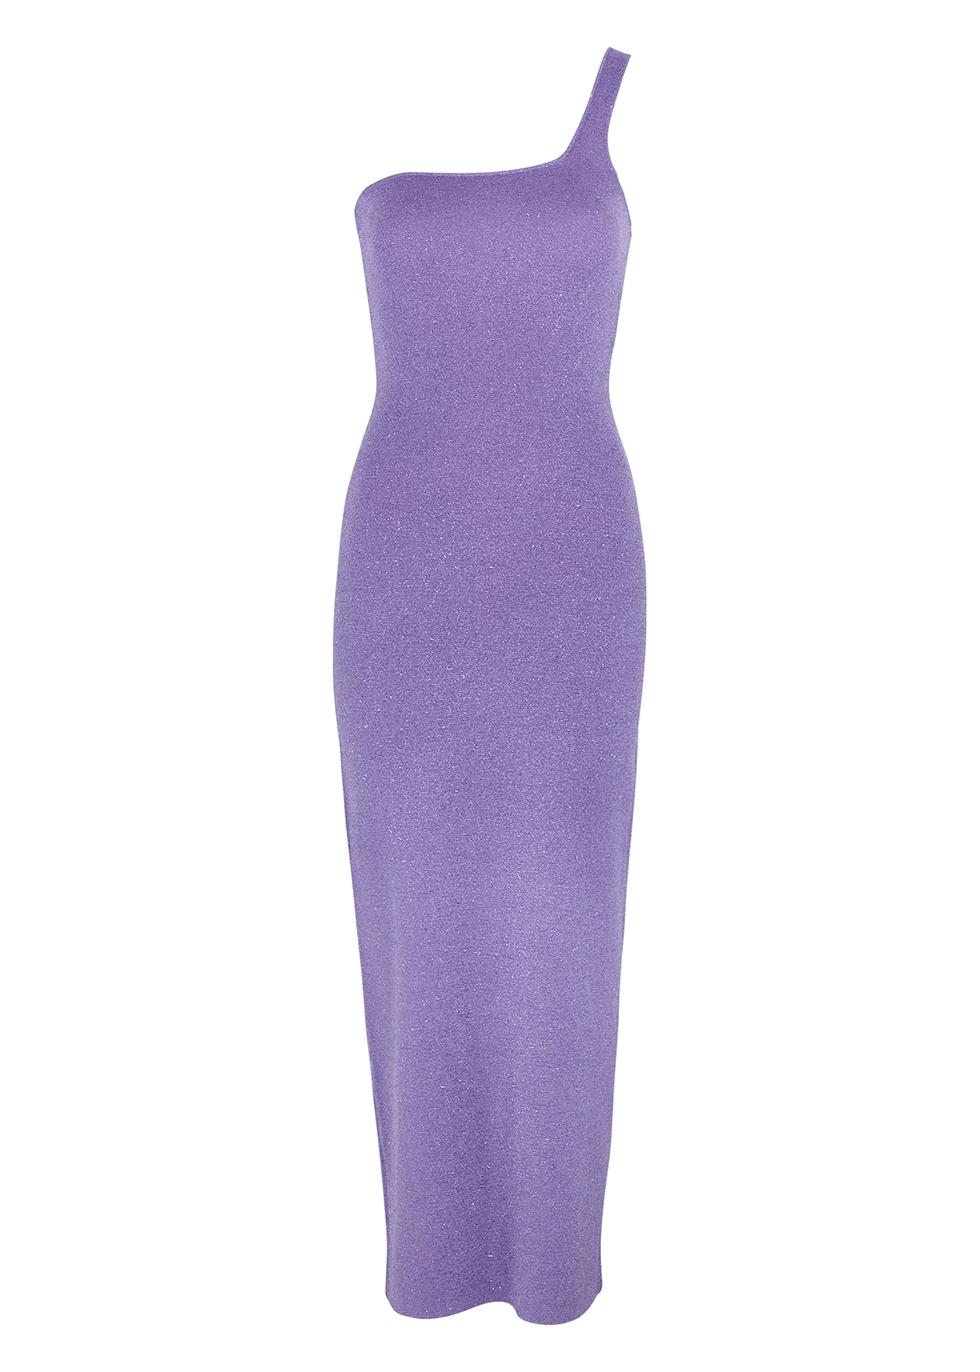 Adalane one-shoulder metallic-weave midi dress